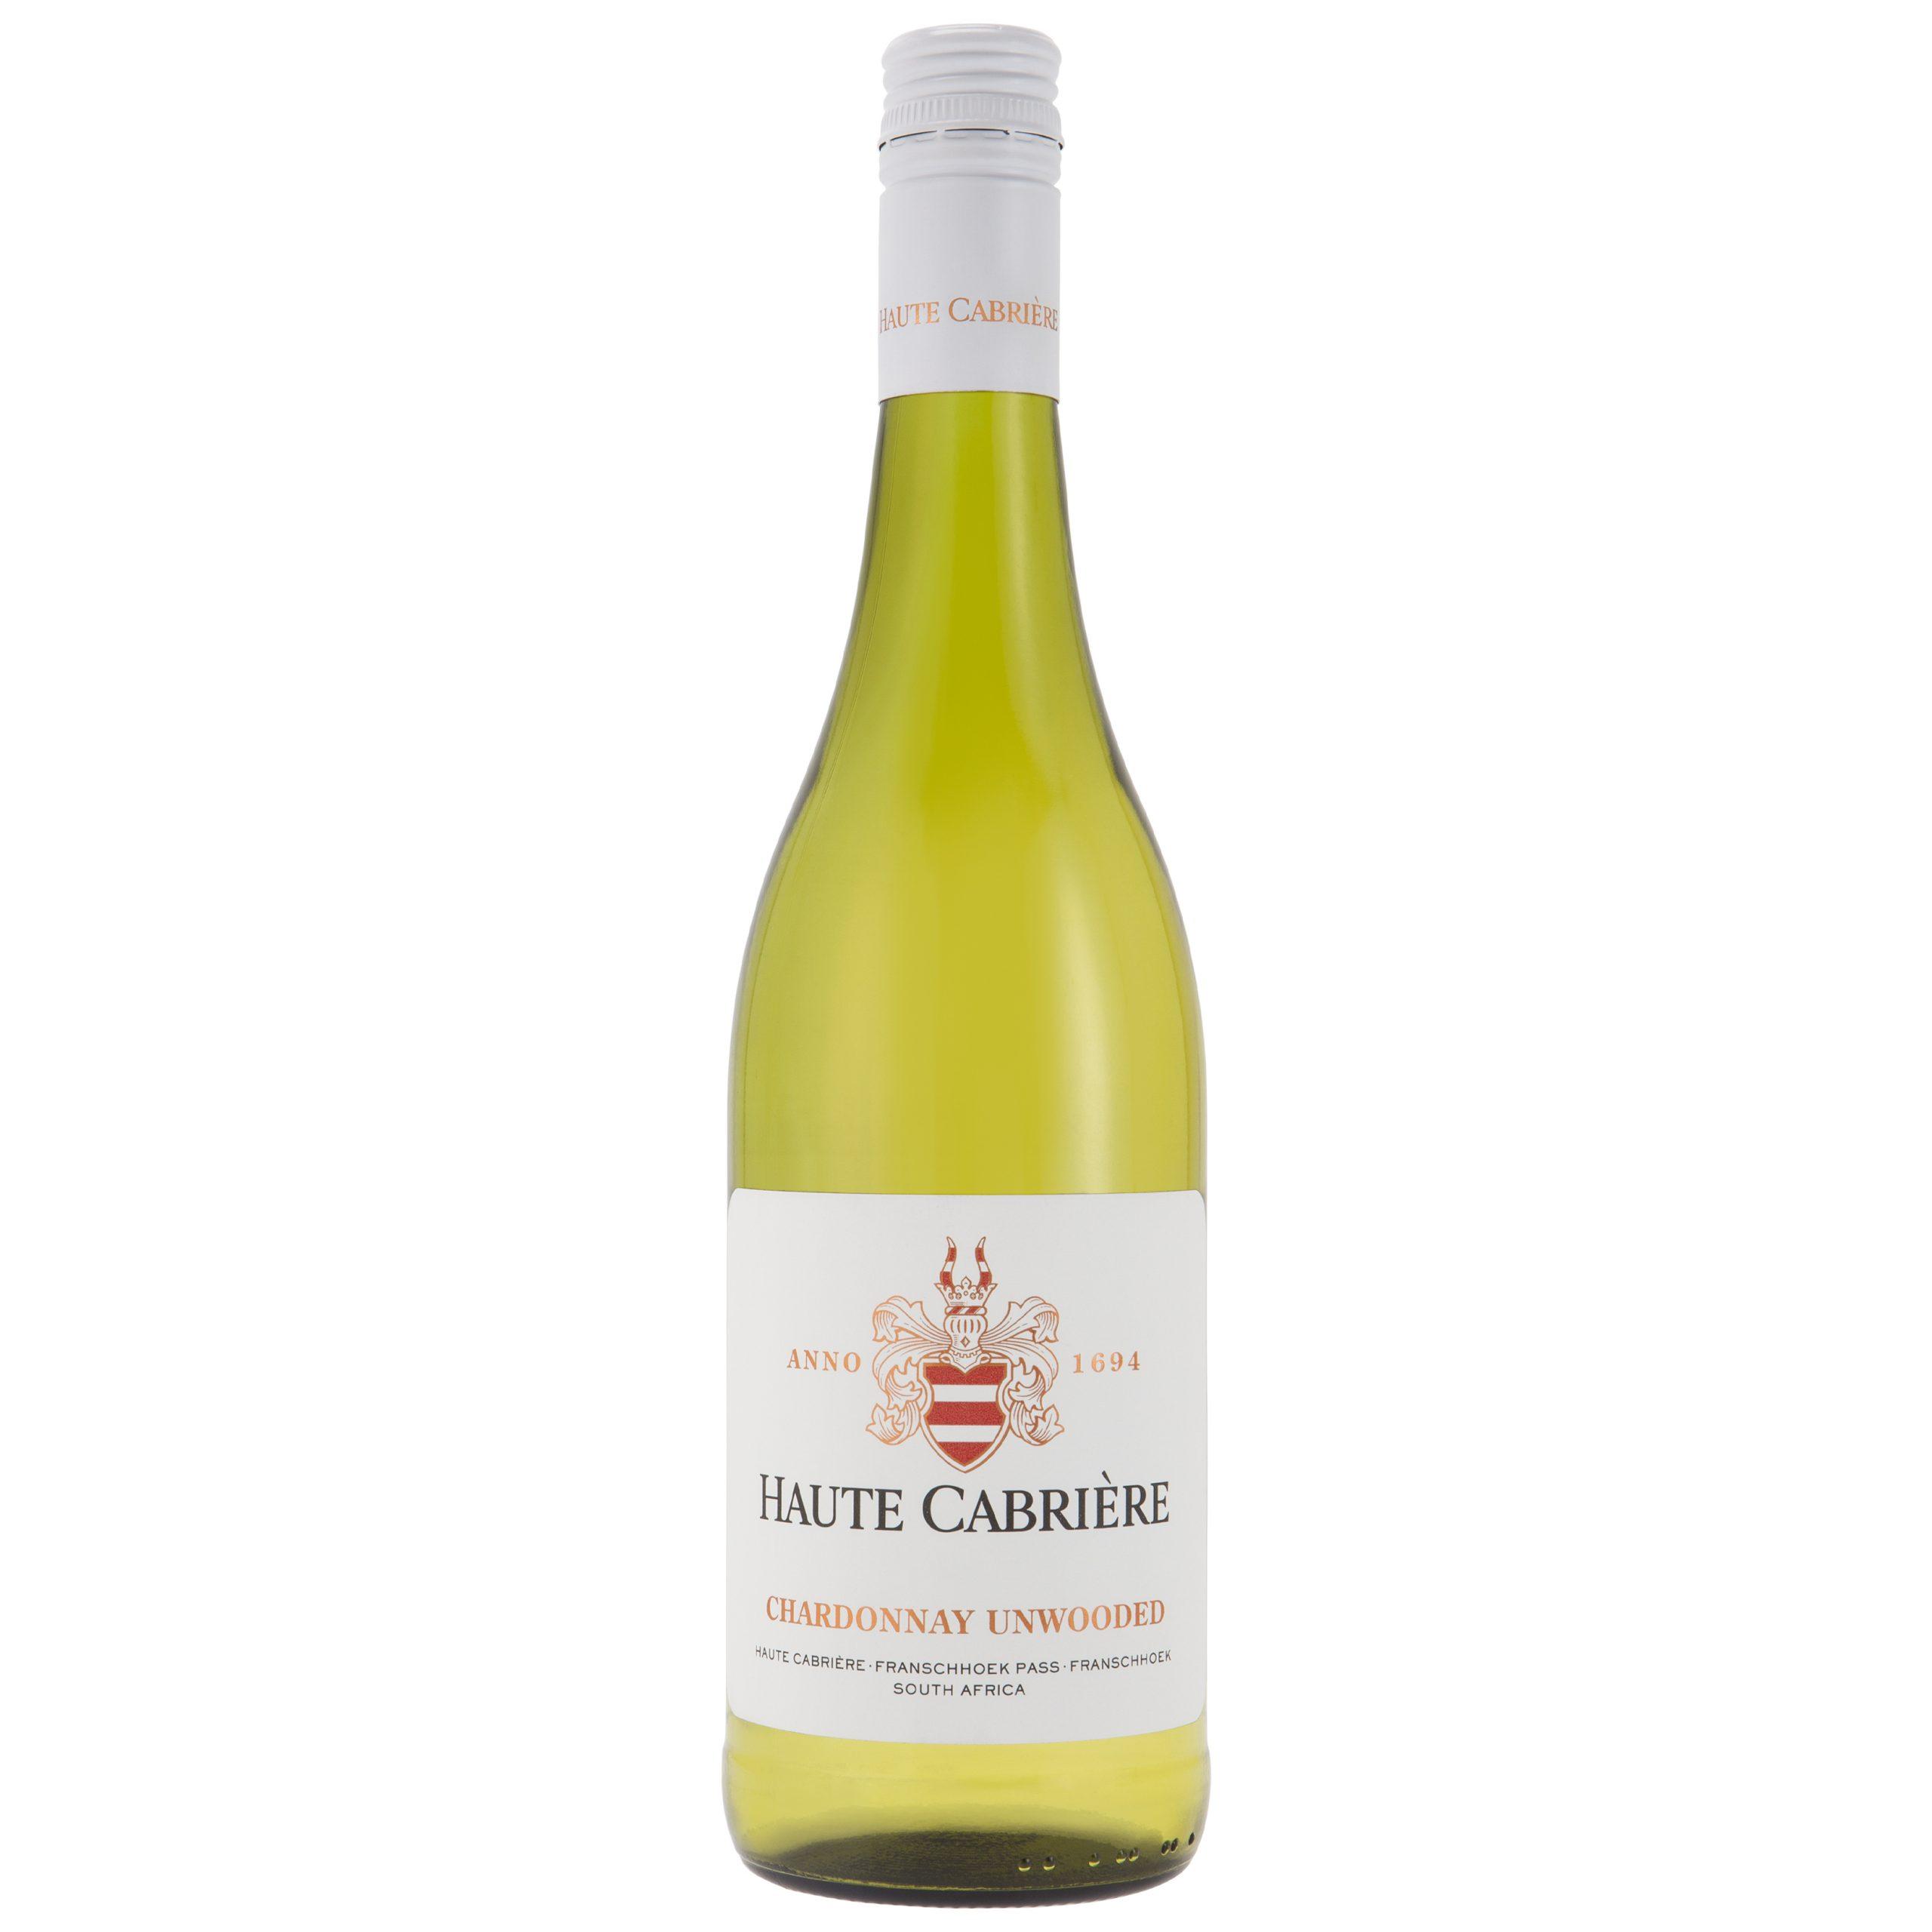 Haute Cabrière - Chardonnay Unwooded